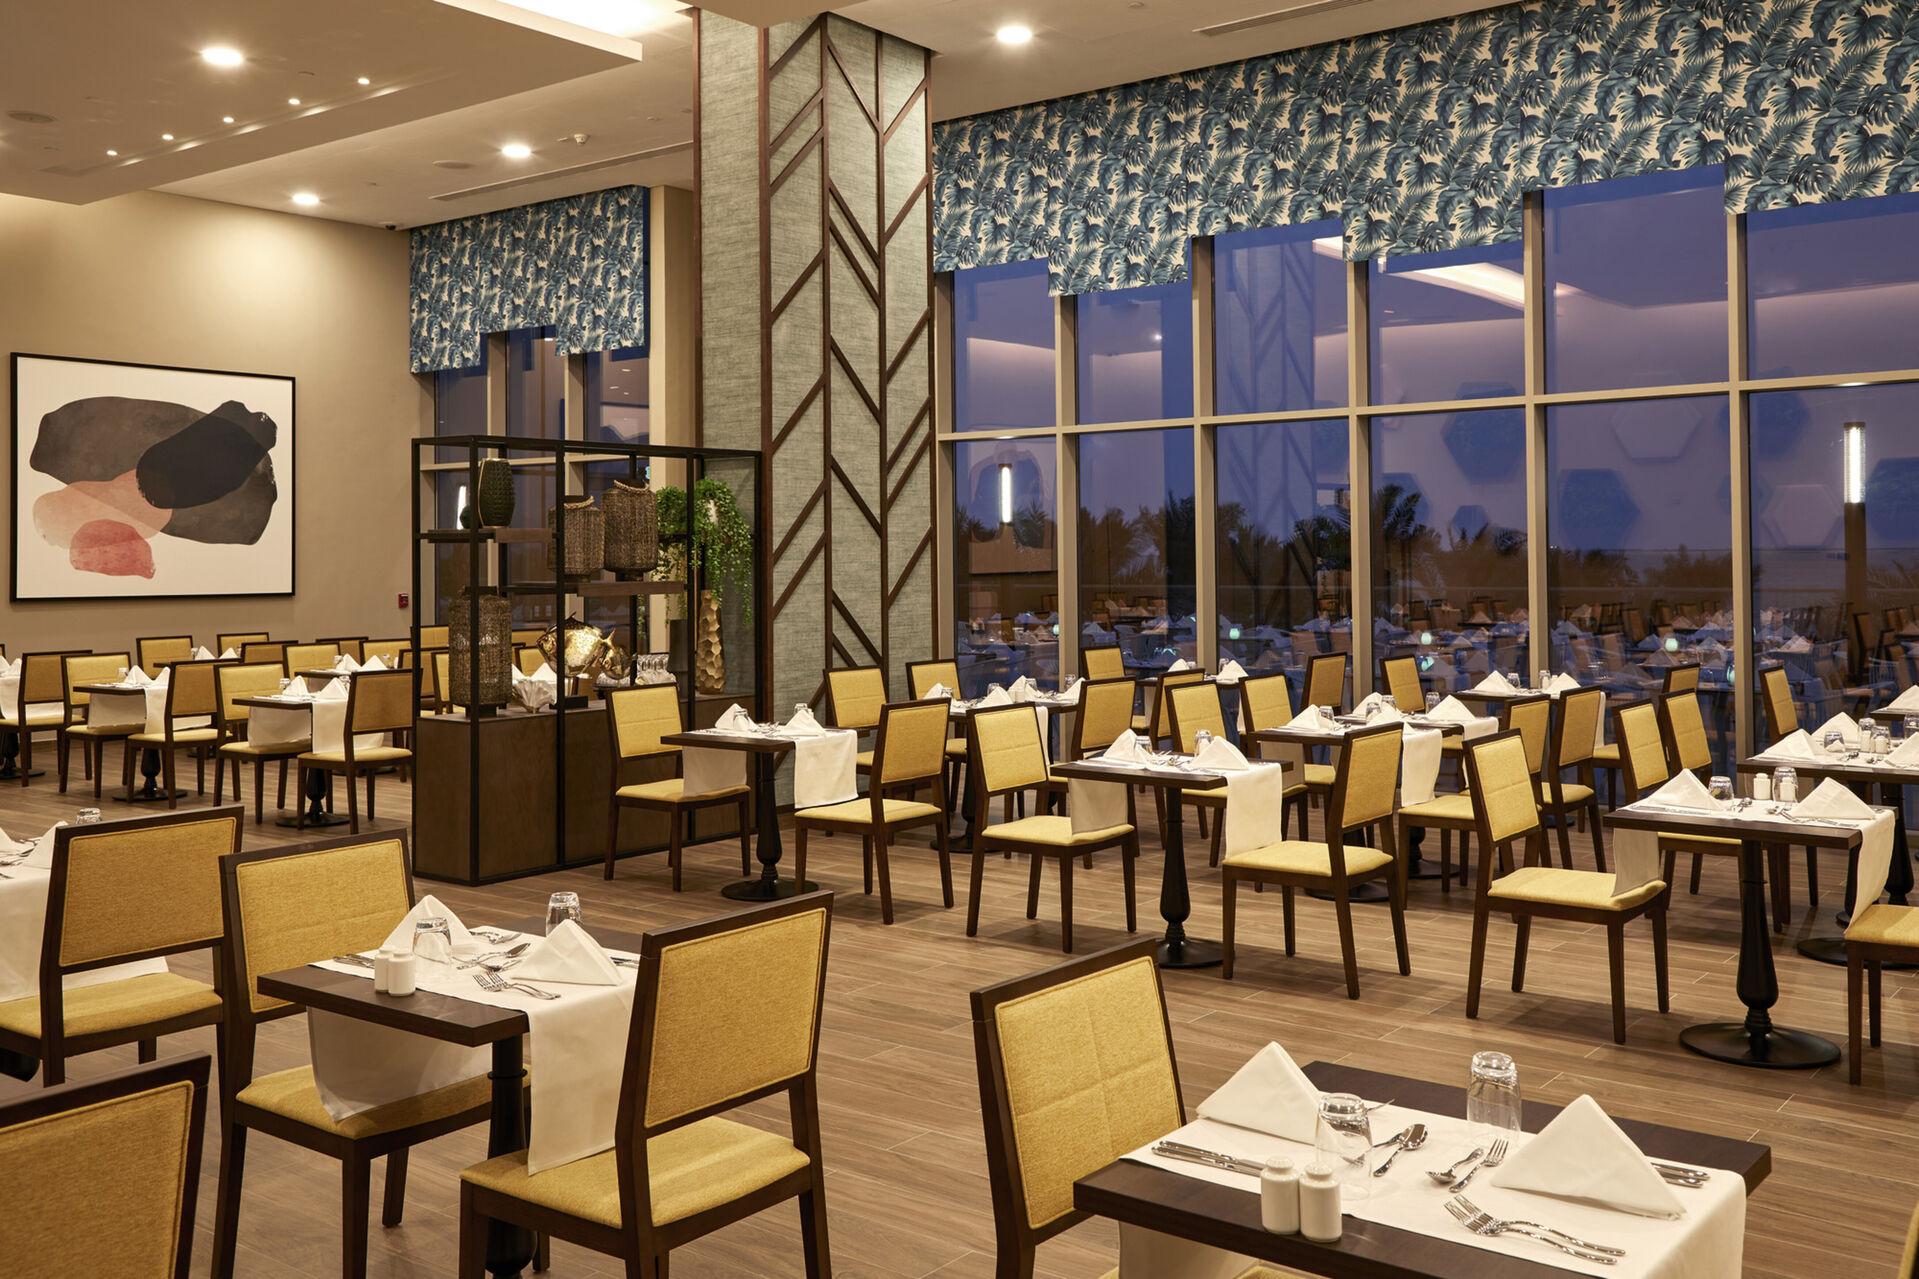 https://cms.satur.sk/data/imgs/tour_image/orig/dub_20_129-main-restaurant-1939886.jpg